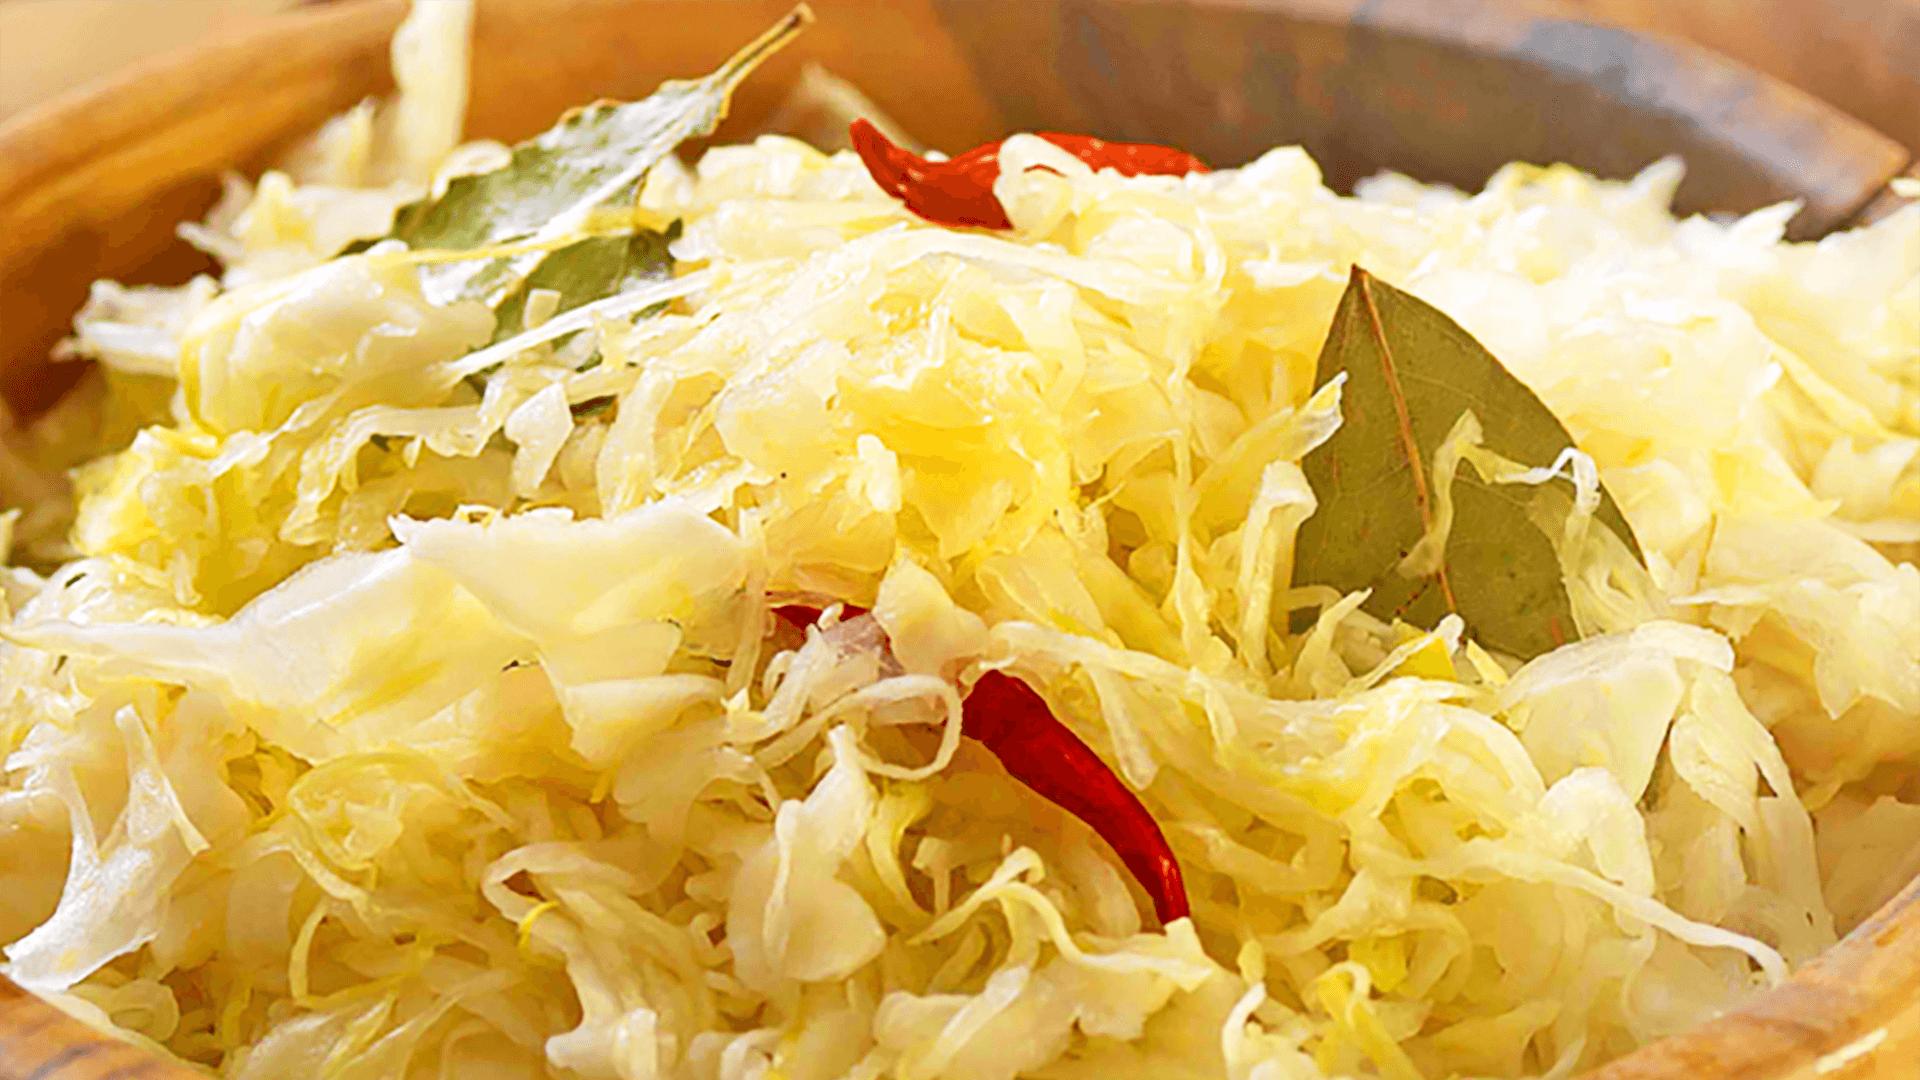 Chopped Sauerkraut